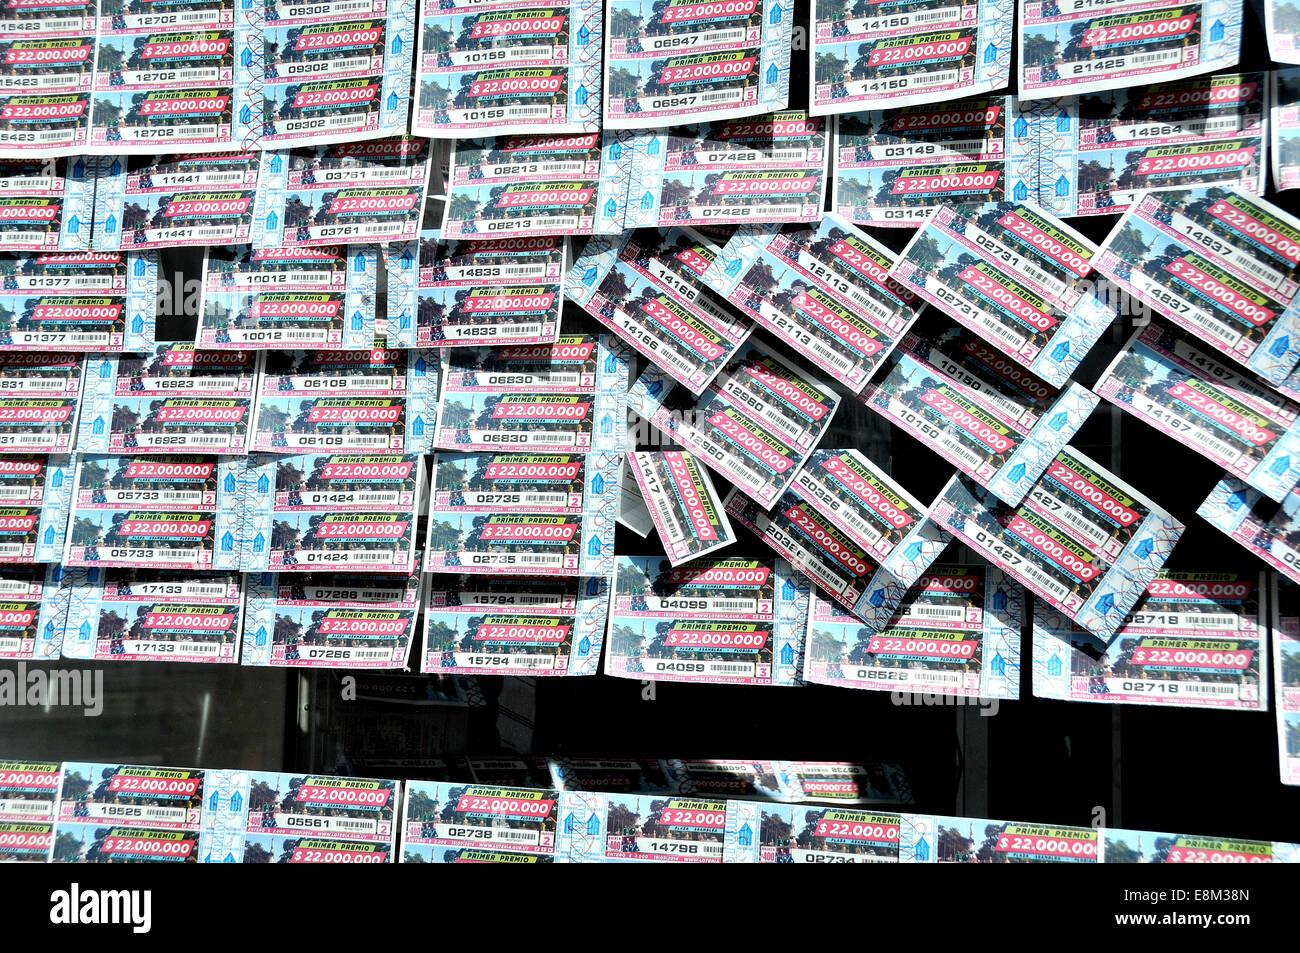 lottery tickets Montevideo Uruguay - Stock Image